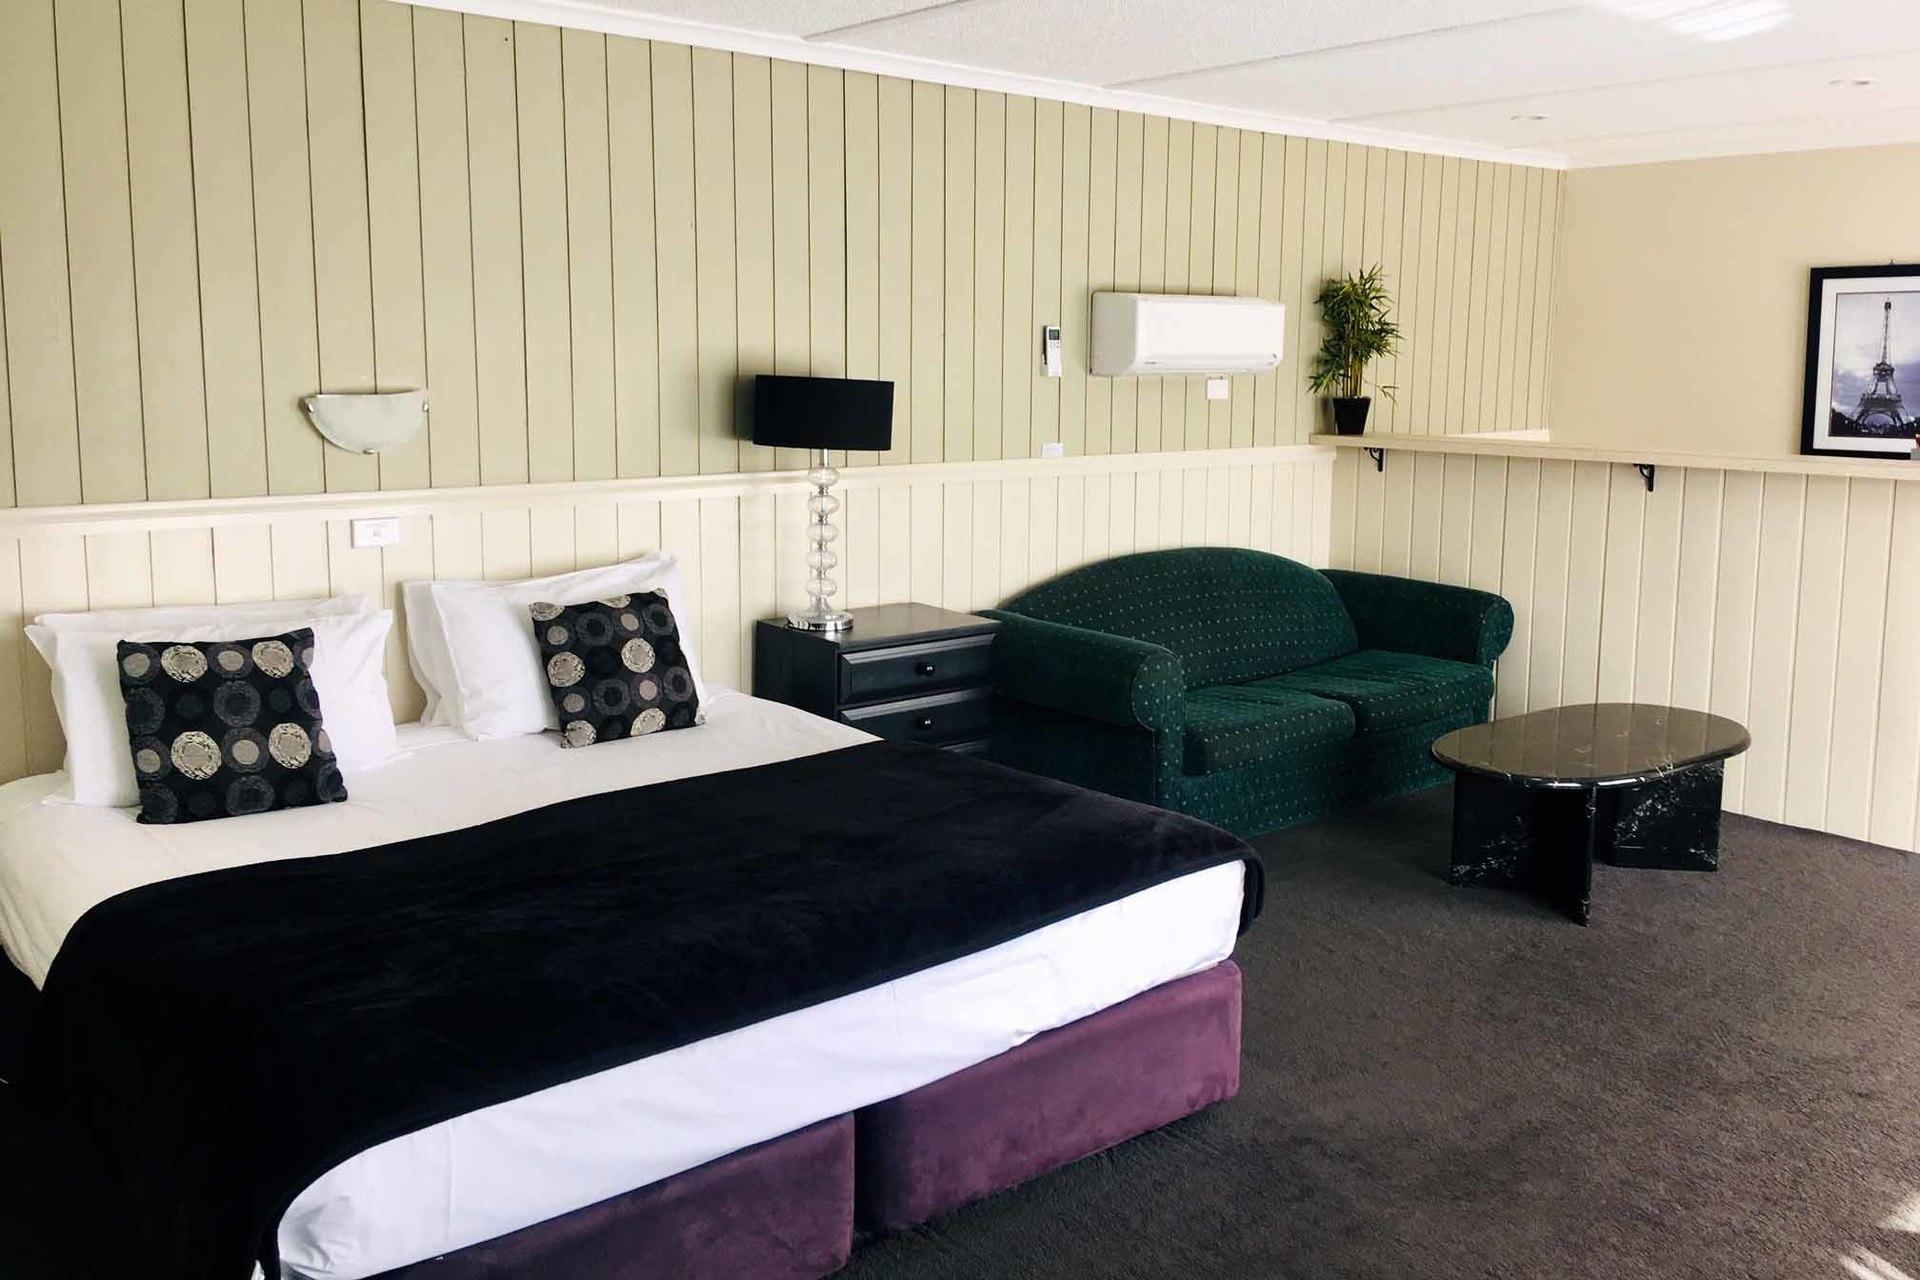 h - Motel Warrnambool